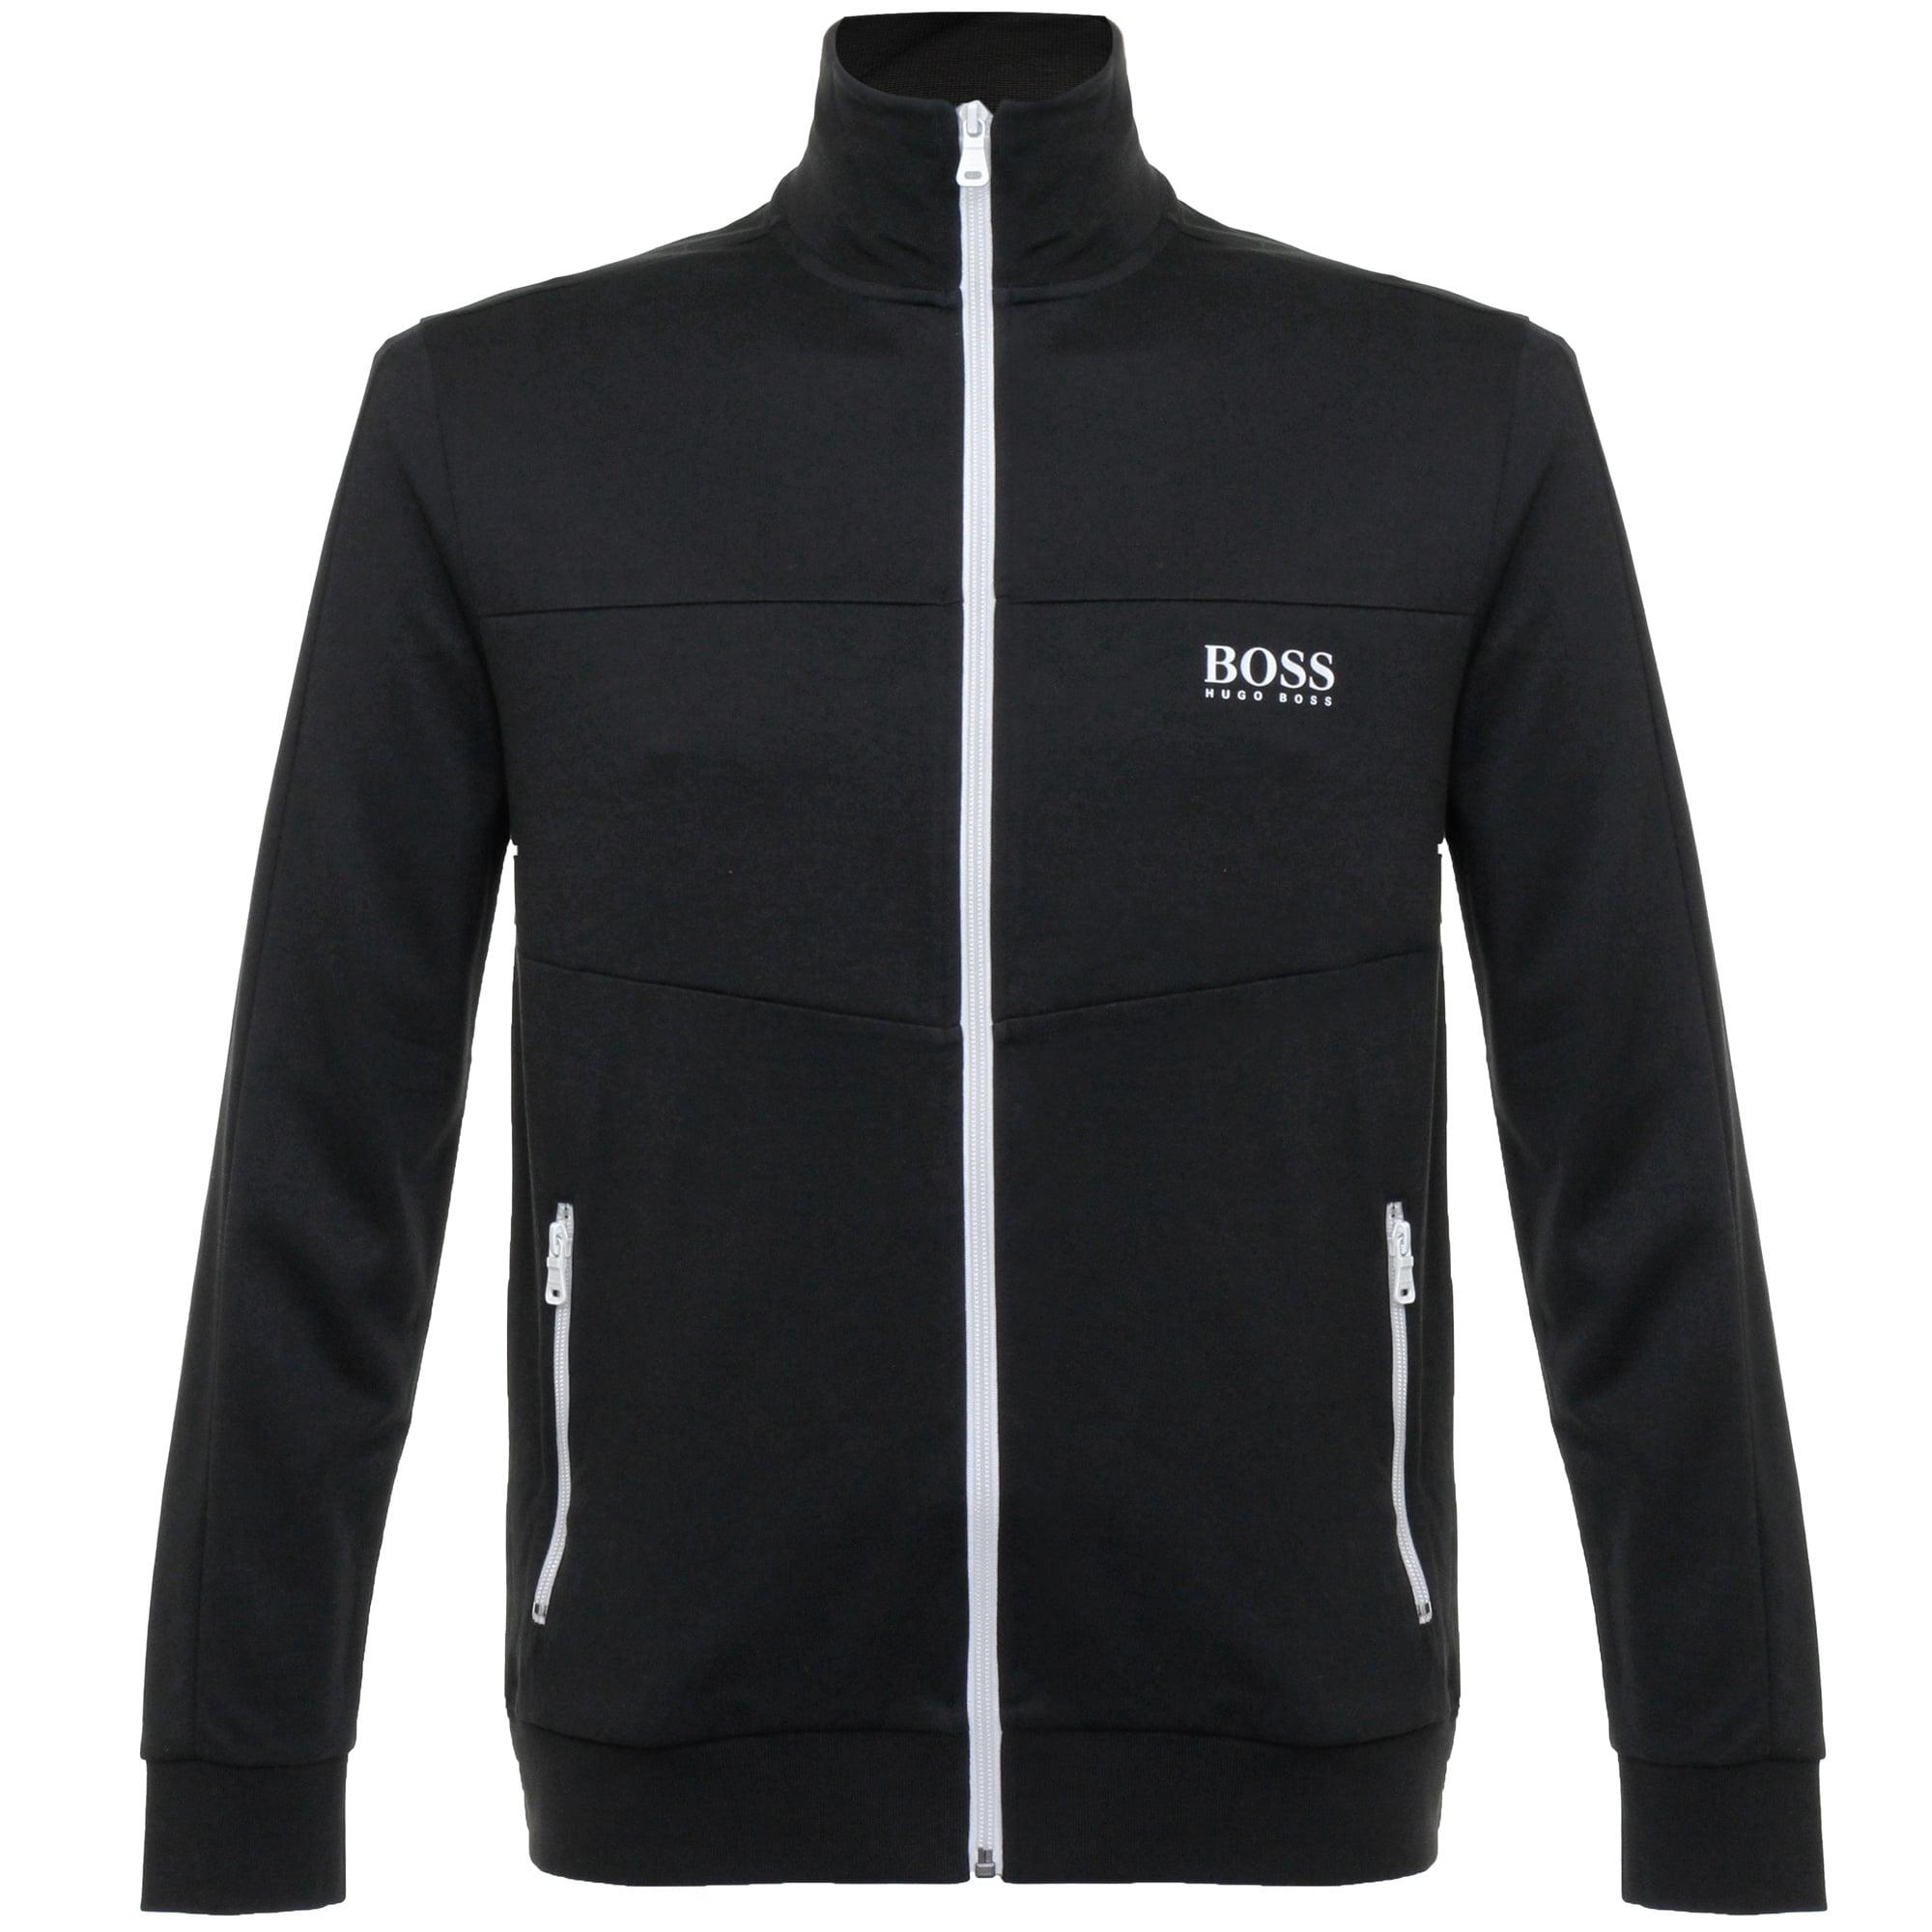 7e9ca9fabb0 Hugo Boss Jacket Zip Black Track Top 50330999